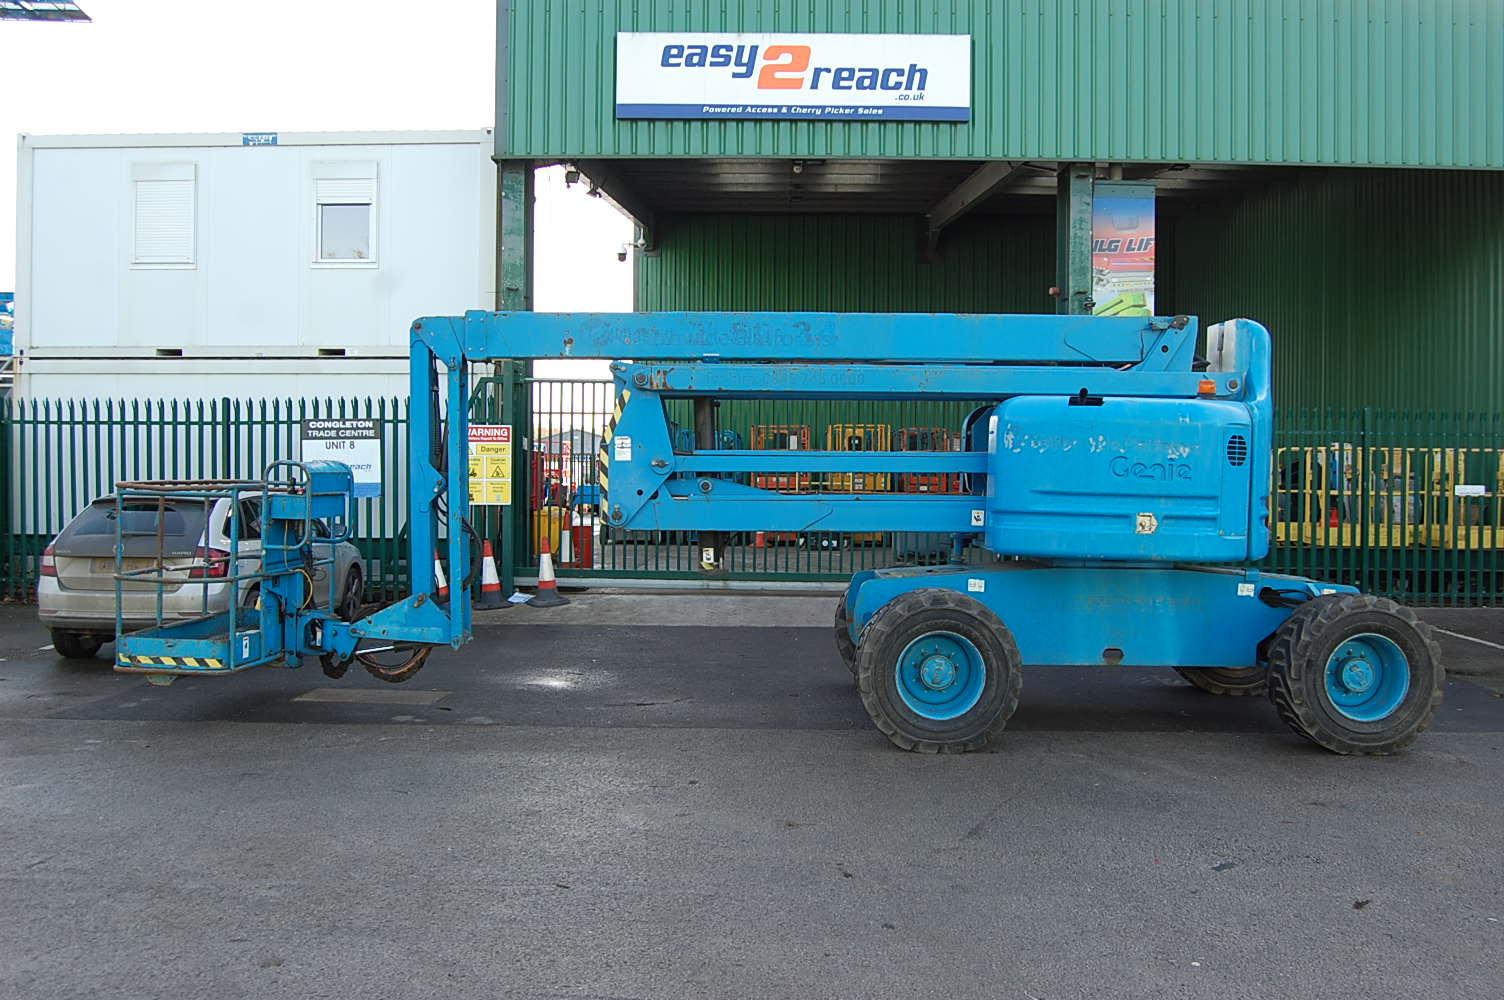 2006 Genie Z60/34 Rough Terrain Diesel Boom Lift 20m